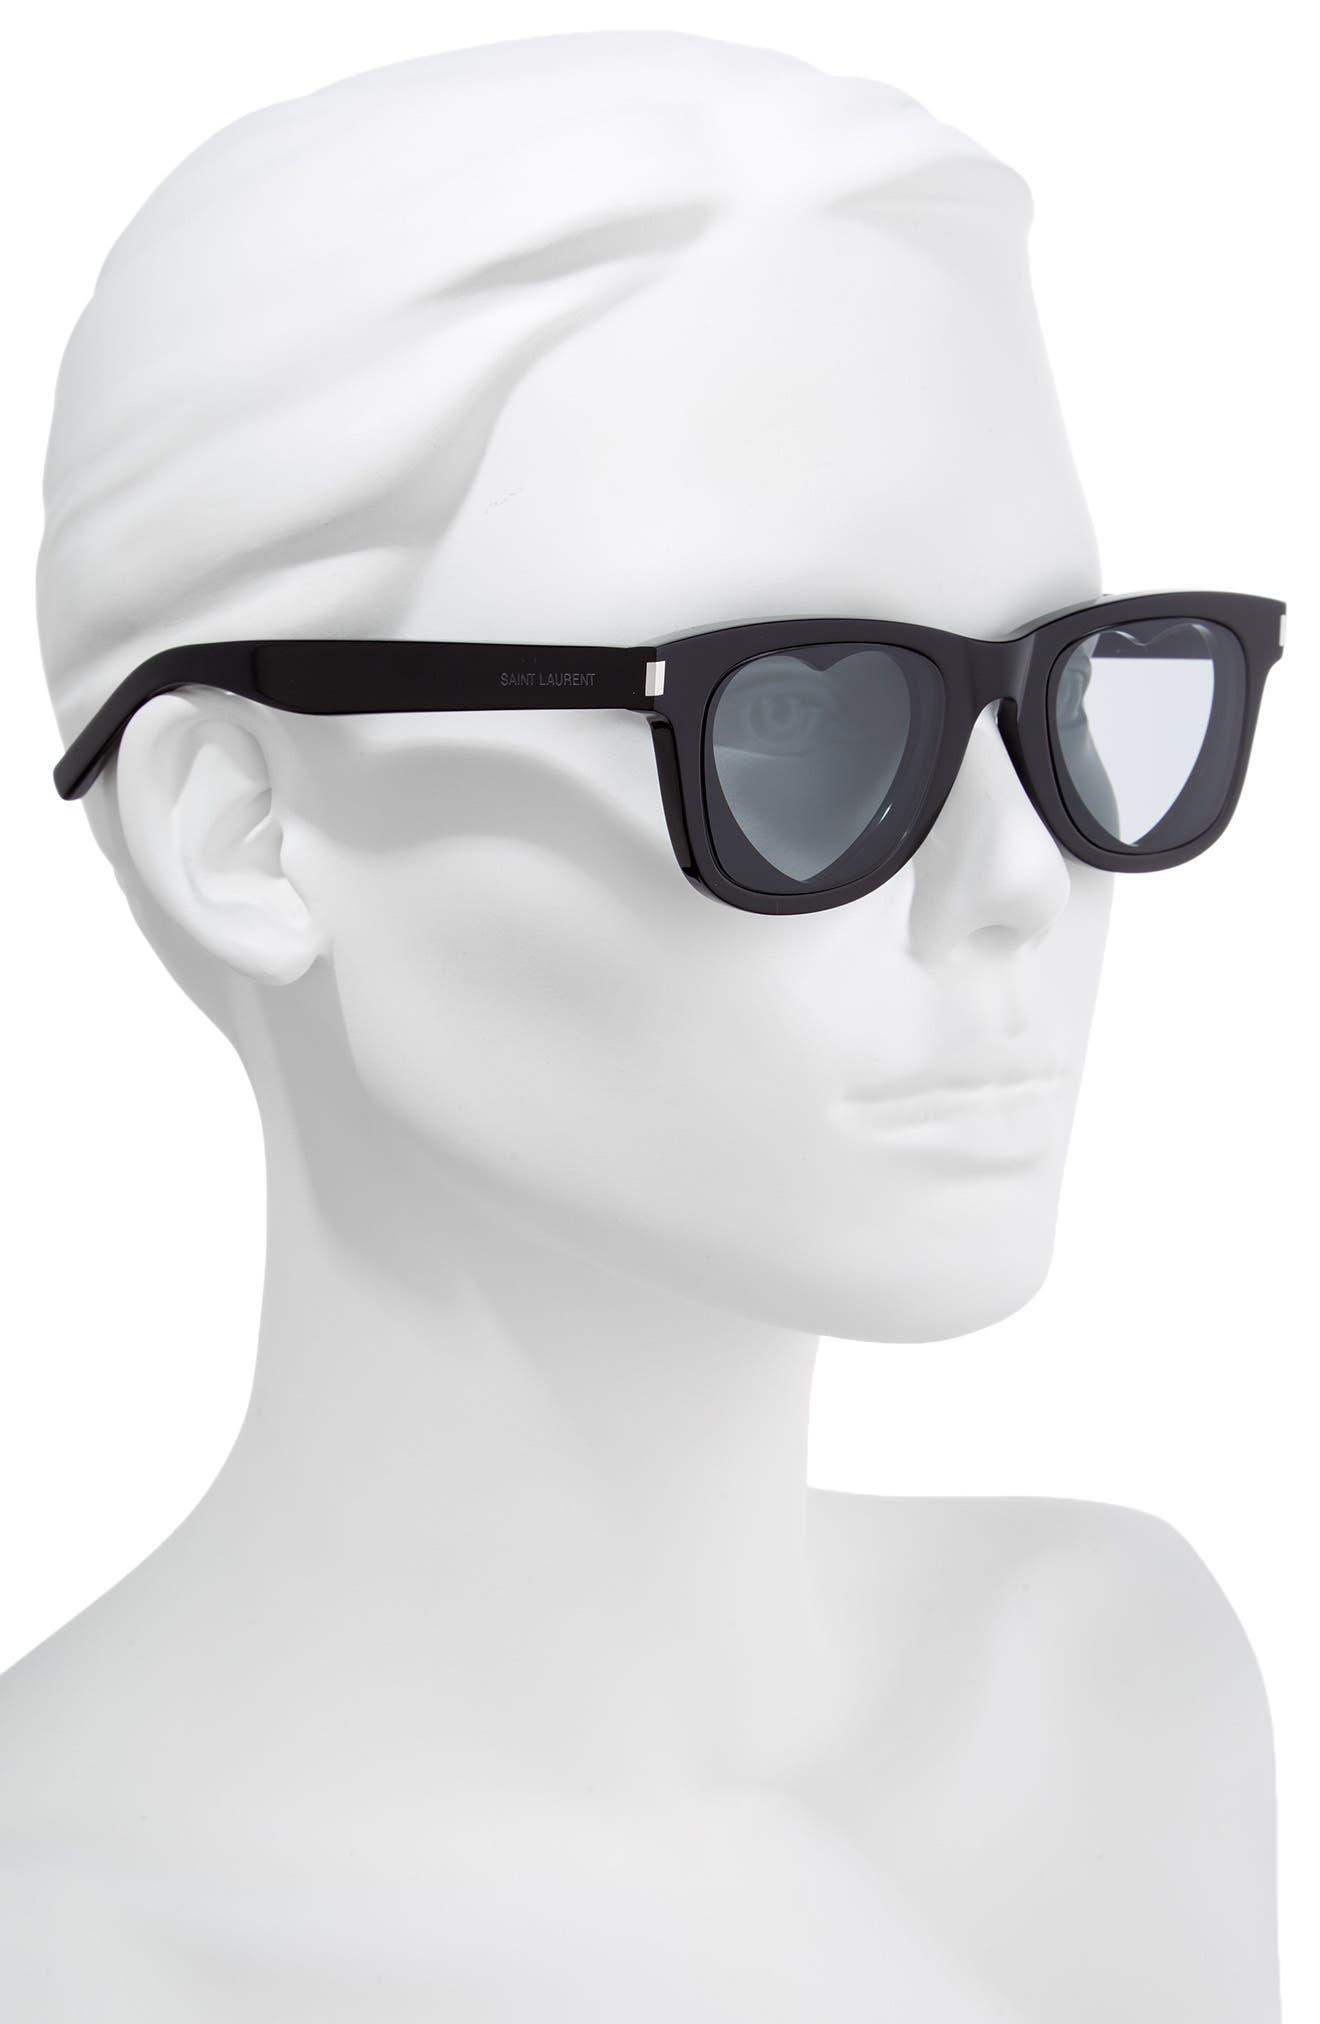 50mm Heart Sunglasses,                             Alternate thumbnail 2, color,                             Black